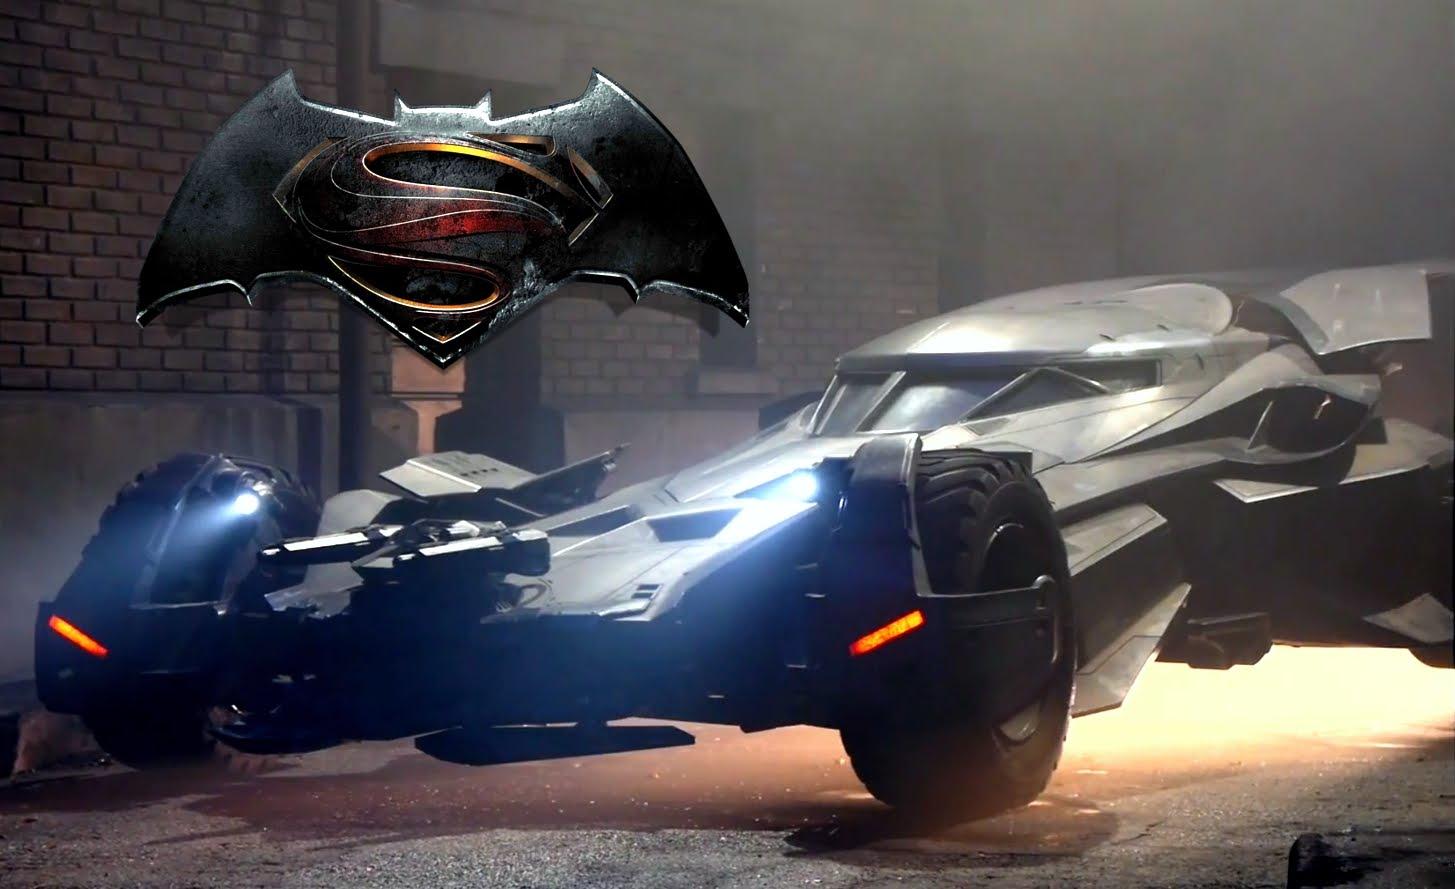 Batmobile 5 Background Wallpaper Car Hd Wallpaper